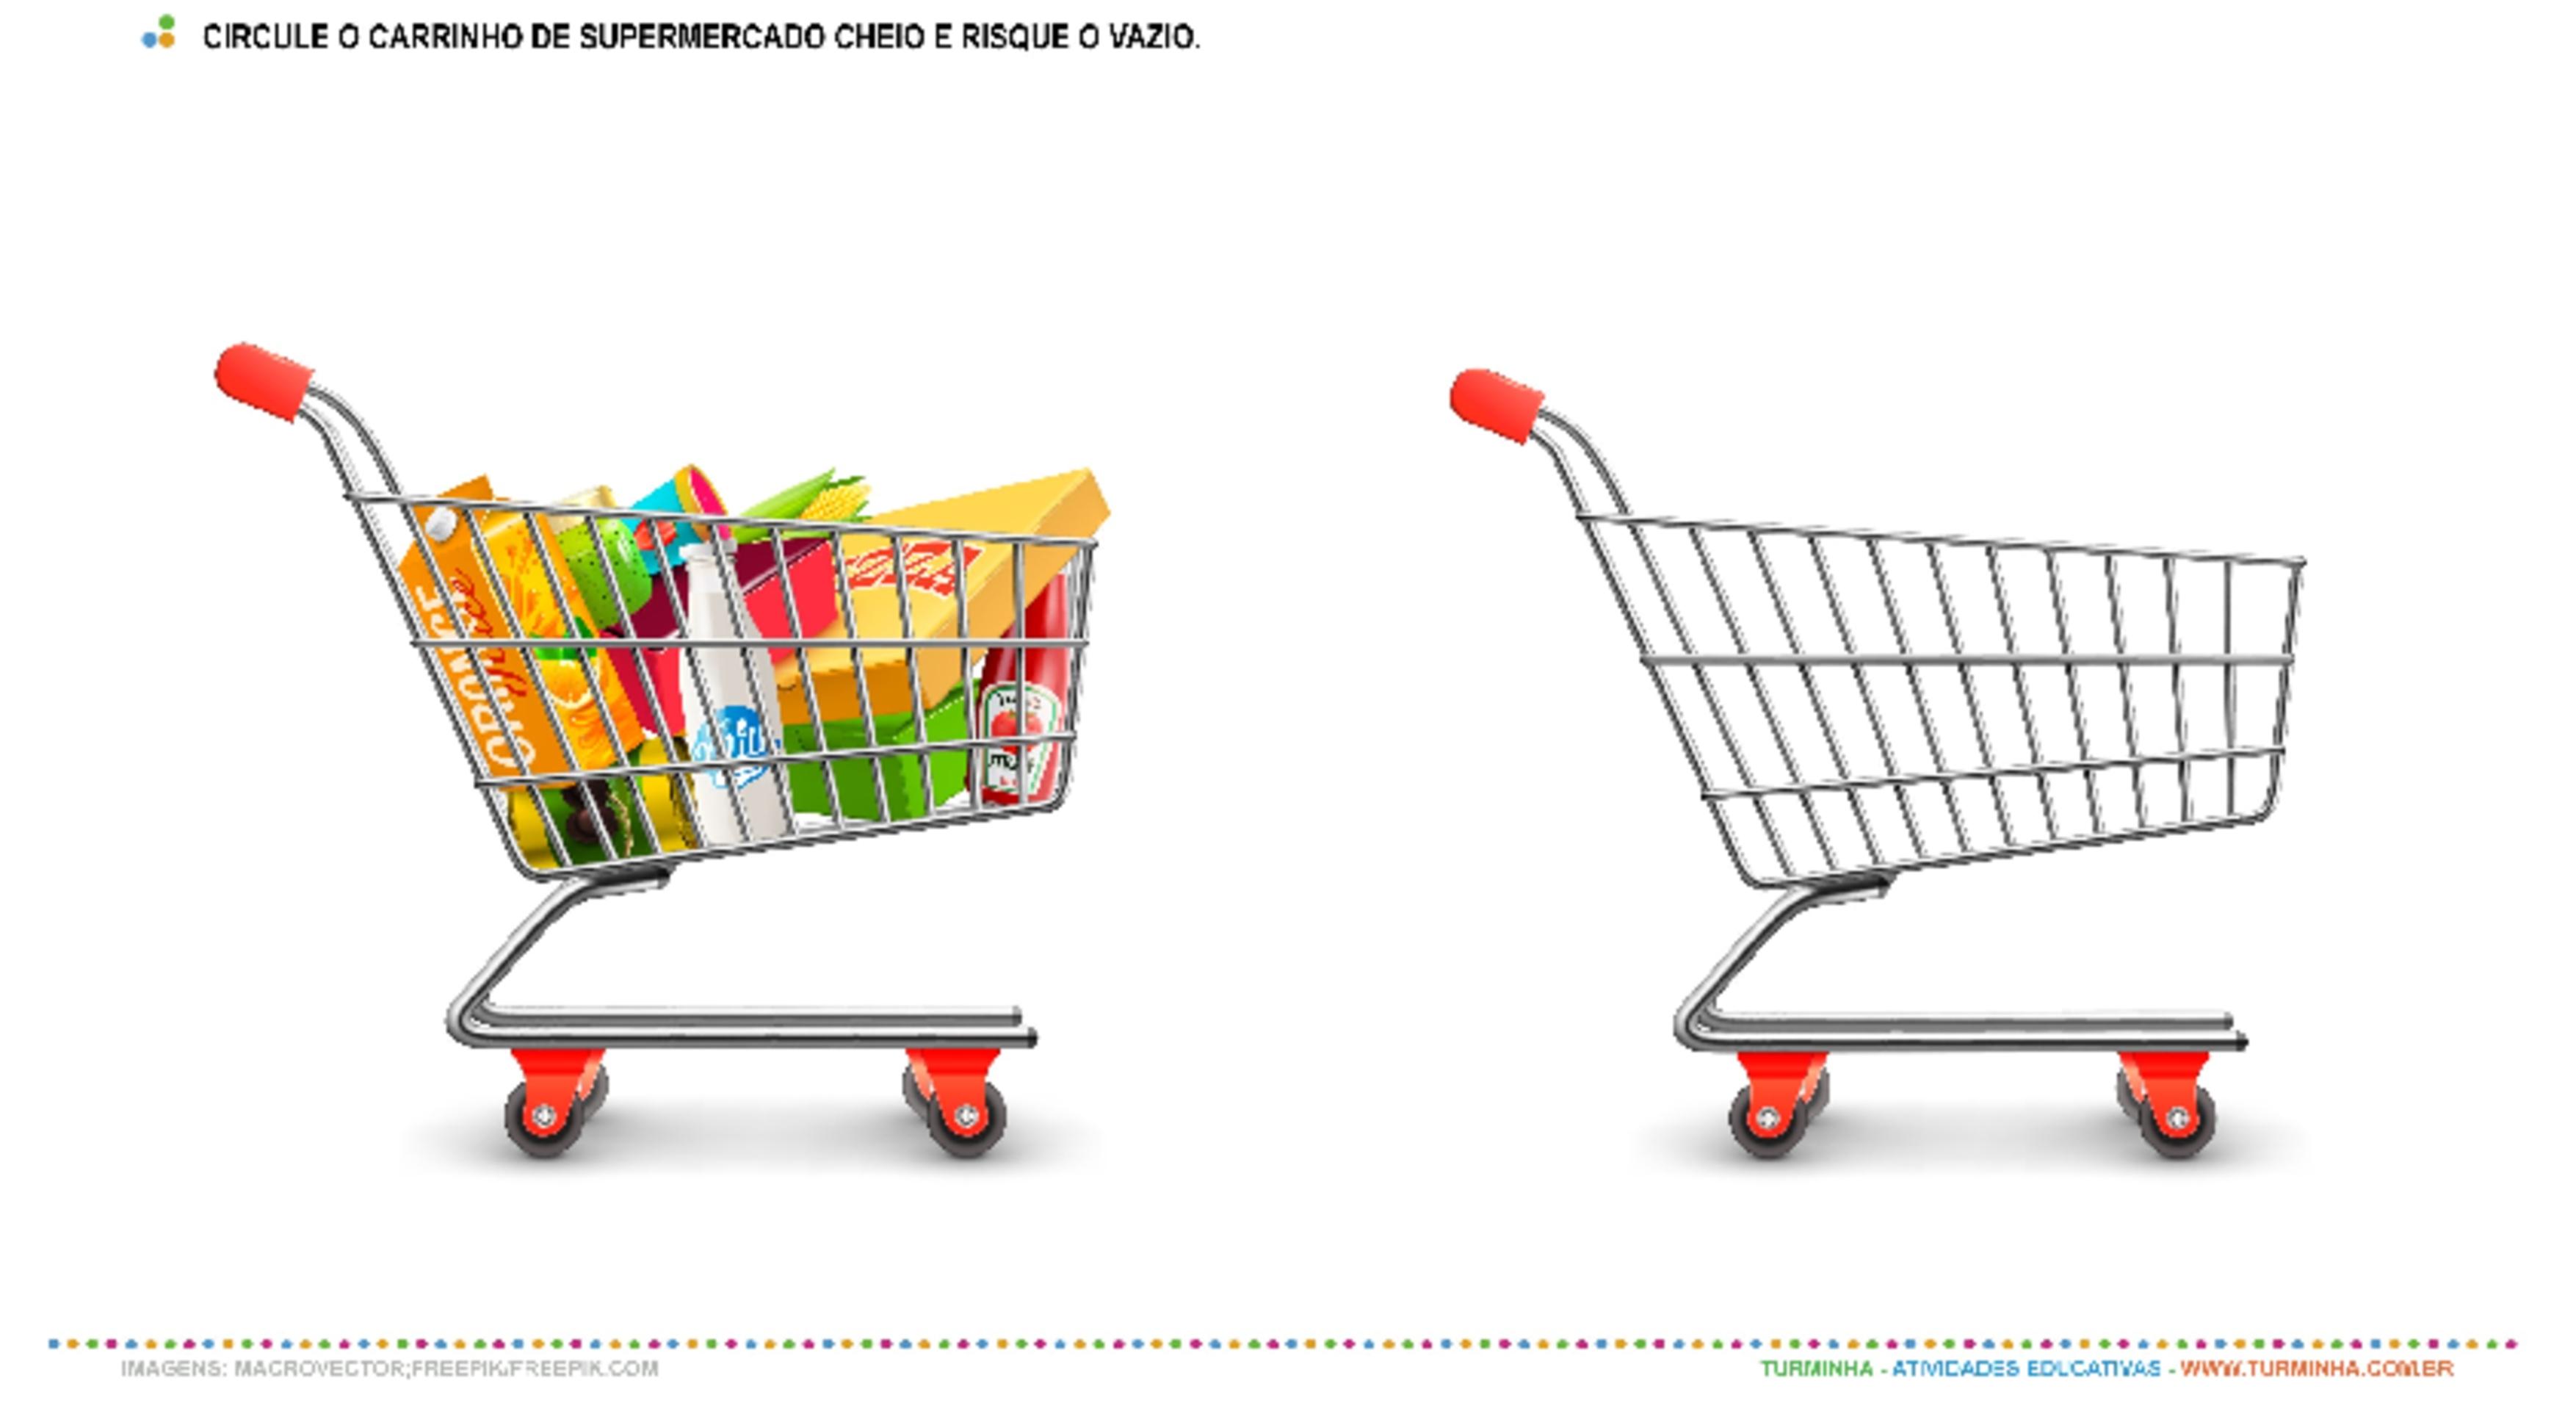 Compras no Supermercado – Cheio ou Vazio - atividade educativa para Creche (0 a 3 anos)